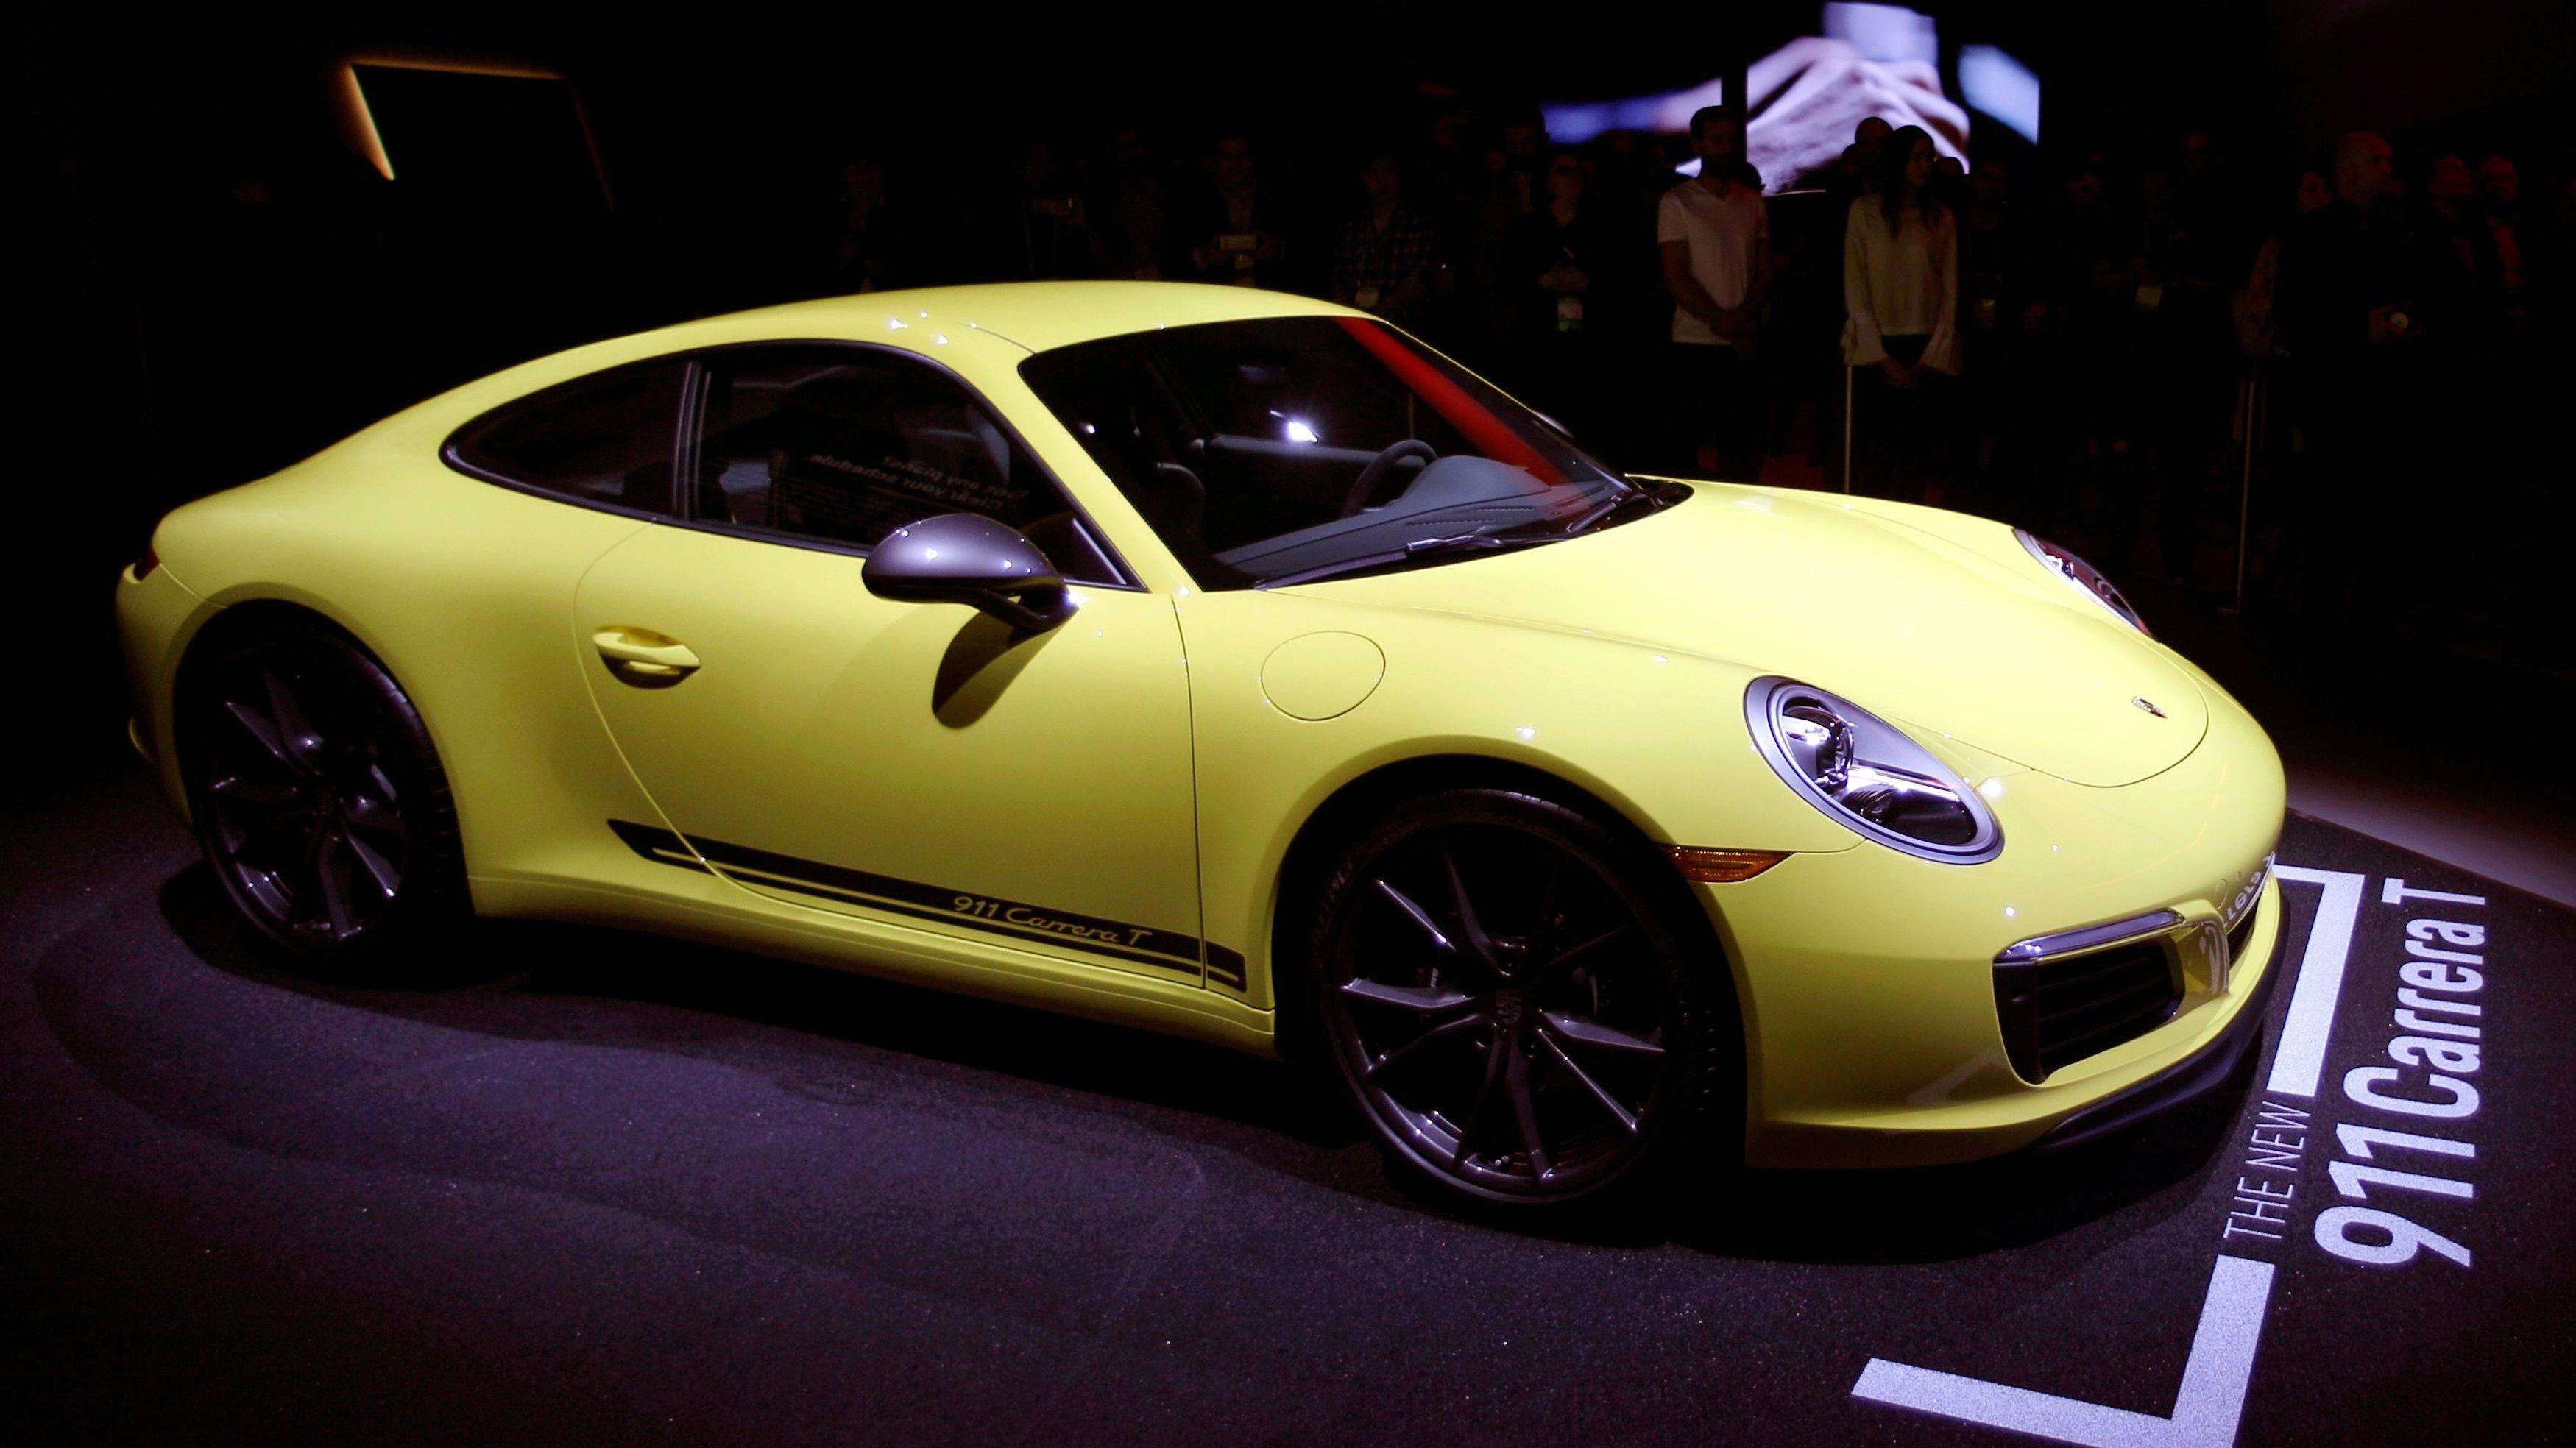 Renting a Porsche is about to get easier | Quartz